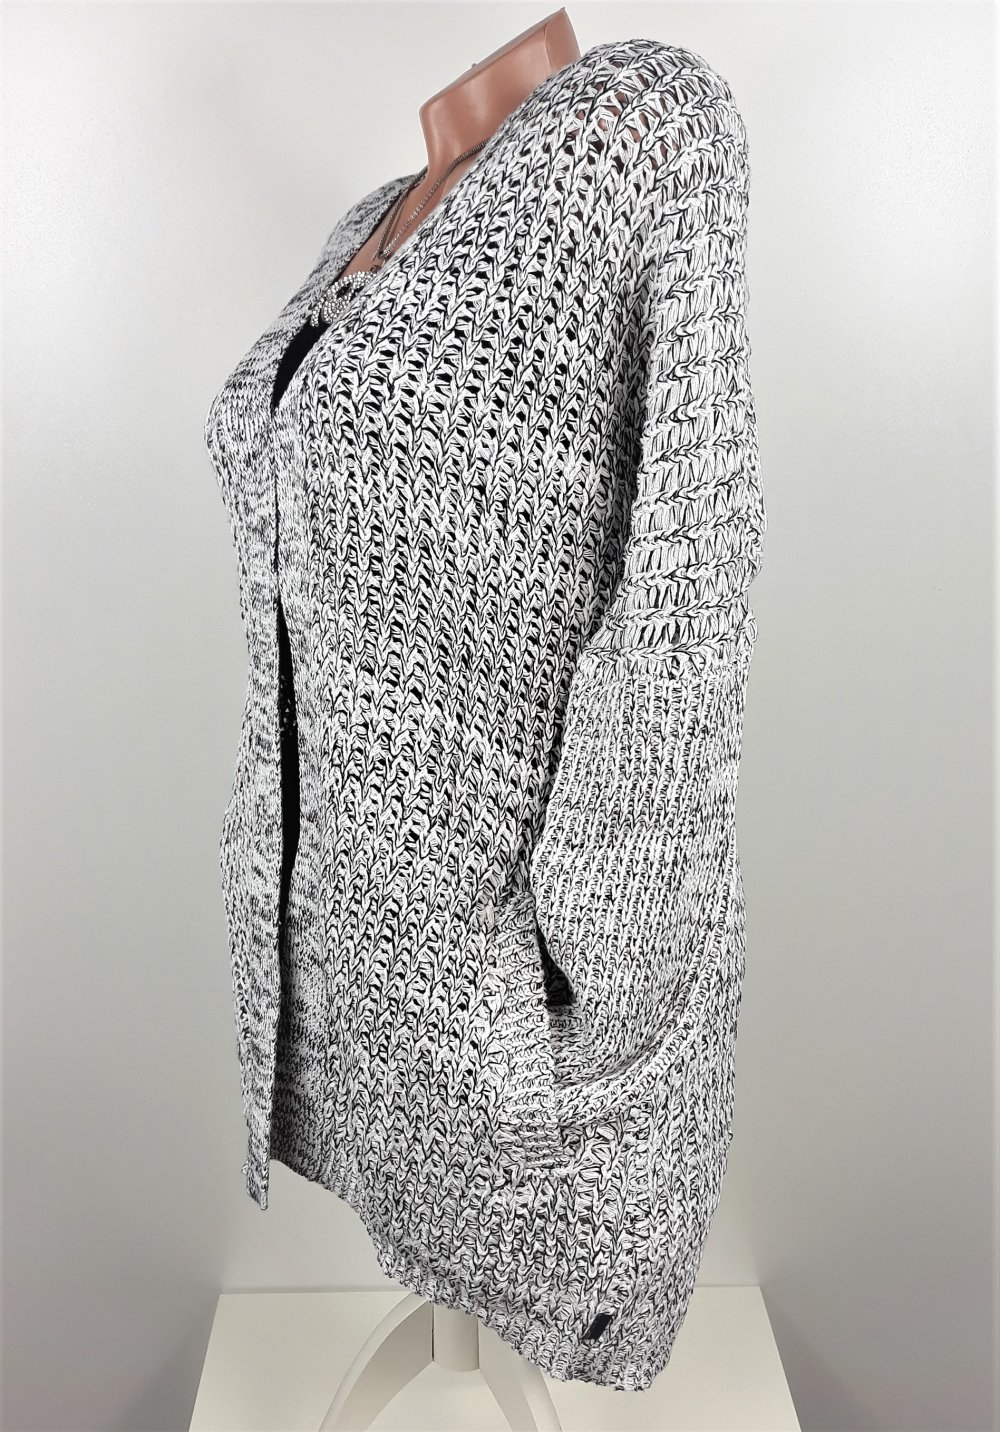 8a8b69b9daa2a7 Strickjacke Cardigan Grobstrick Jacke Oversize grau meliert Größe 40 42 ...